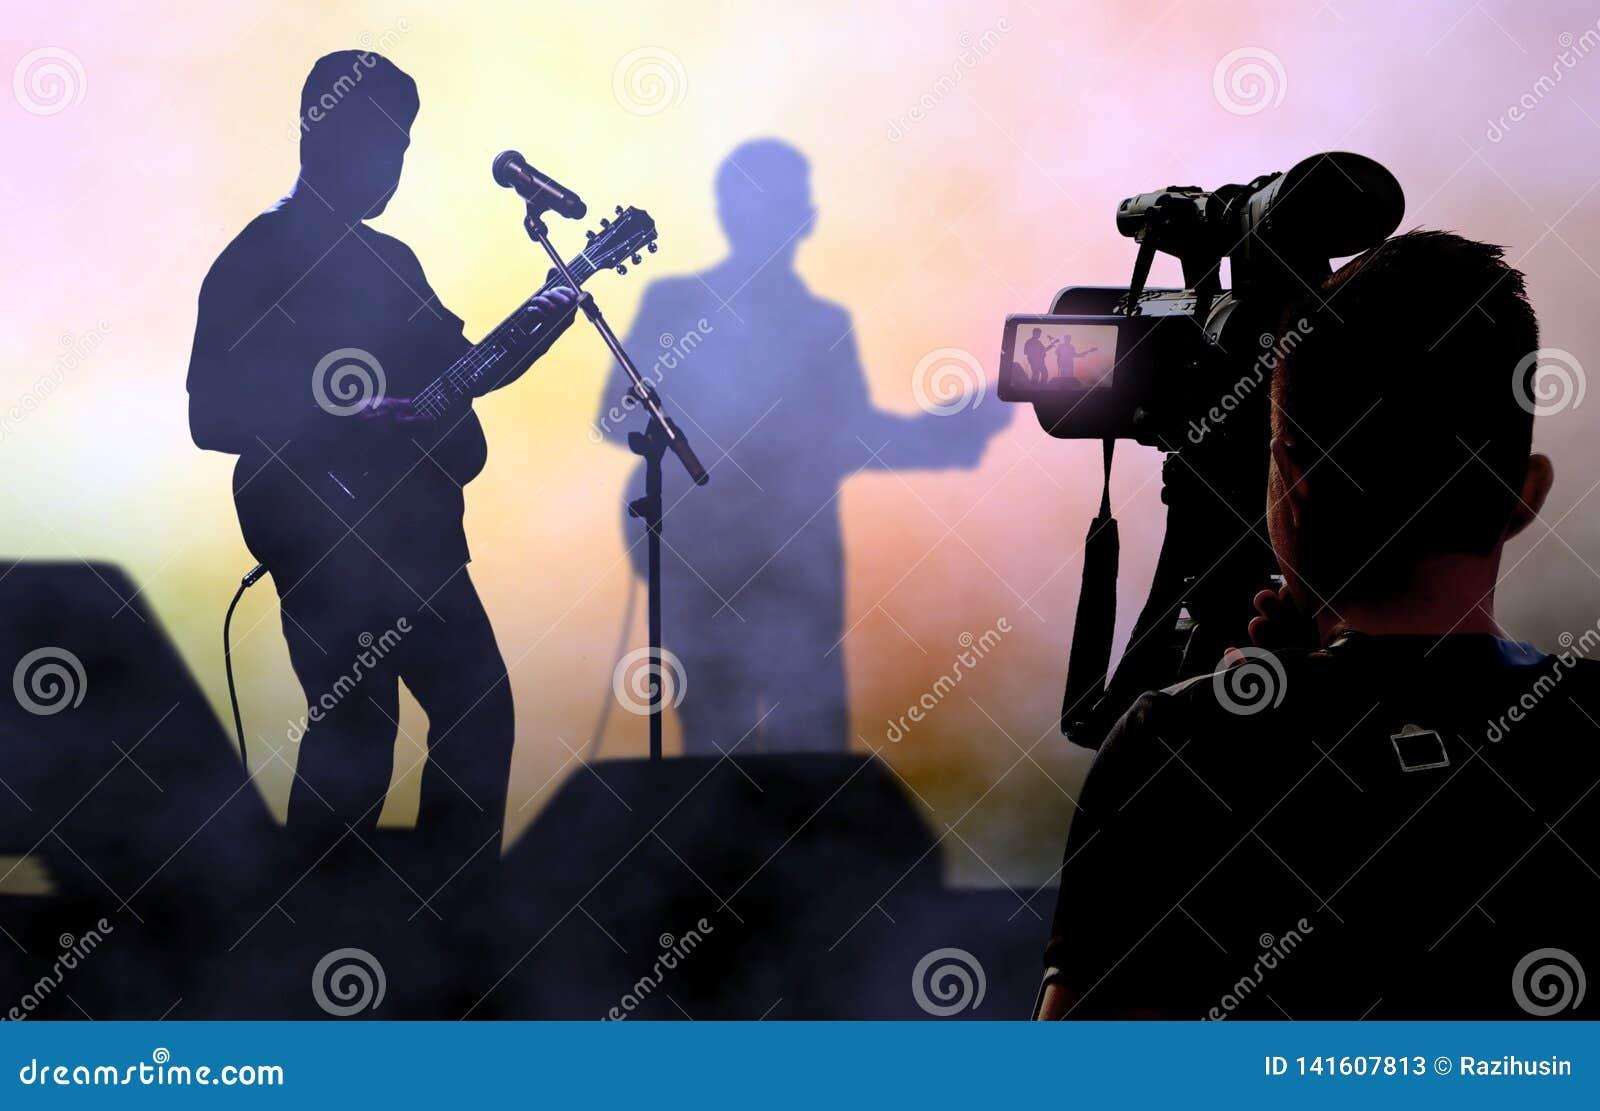 L enregistrement et la radiodiffusion de cameraman vivent sur des concerts utilisant la caméra vidéo